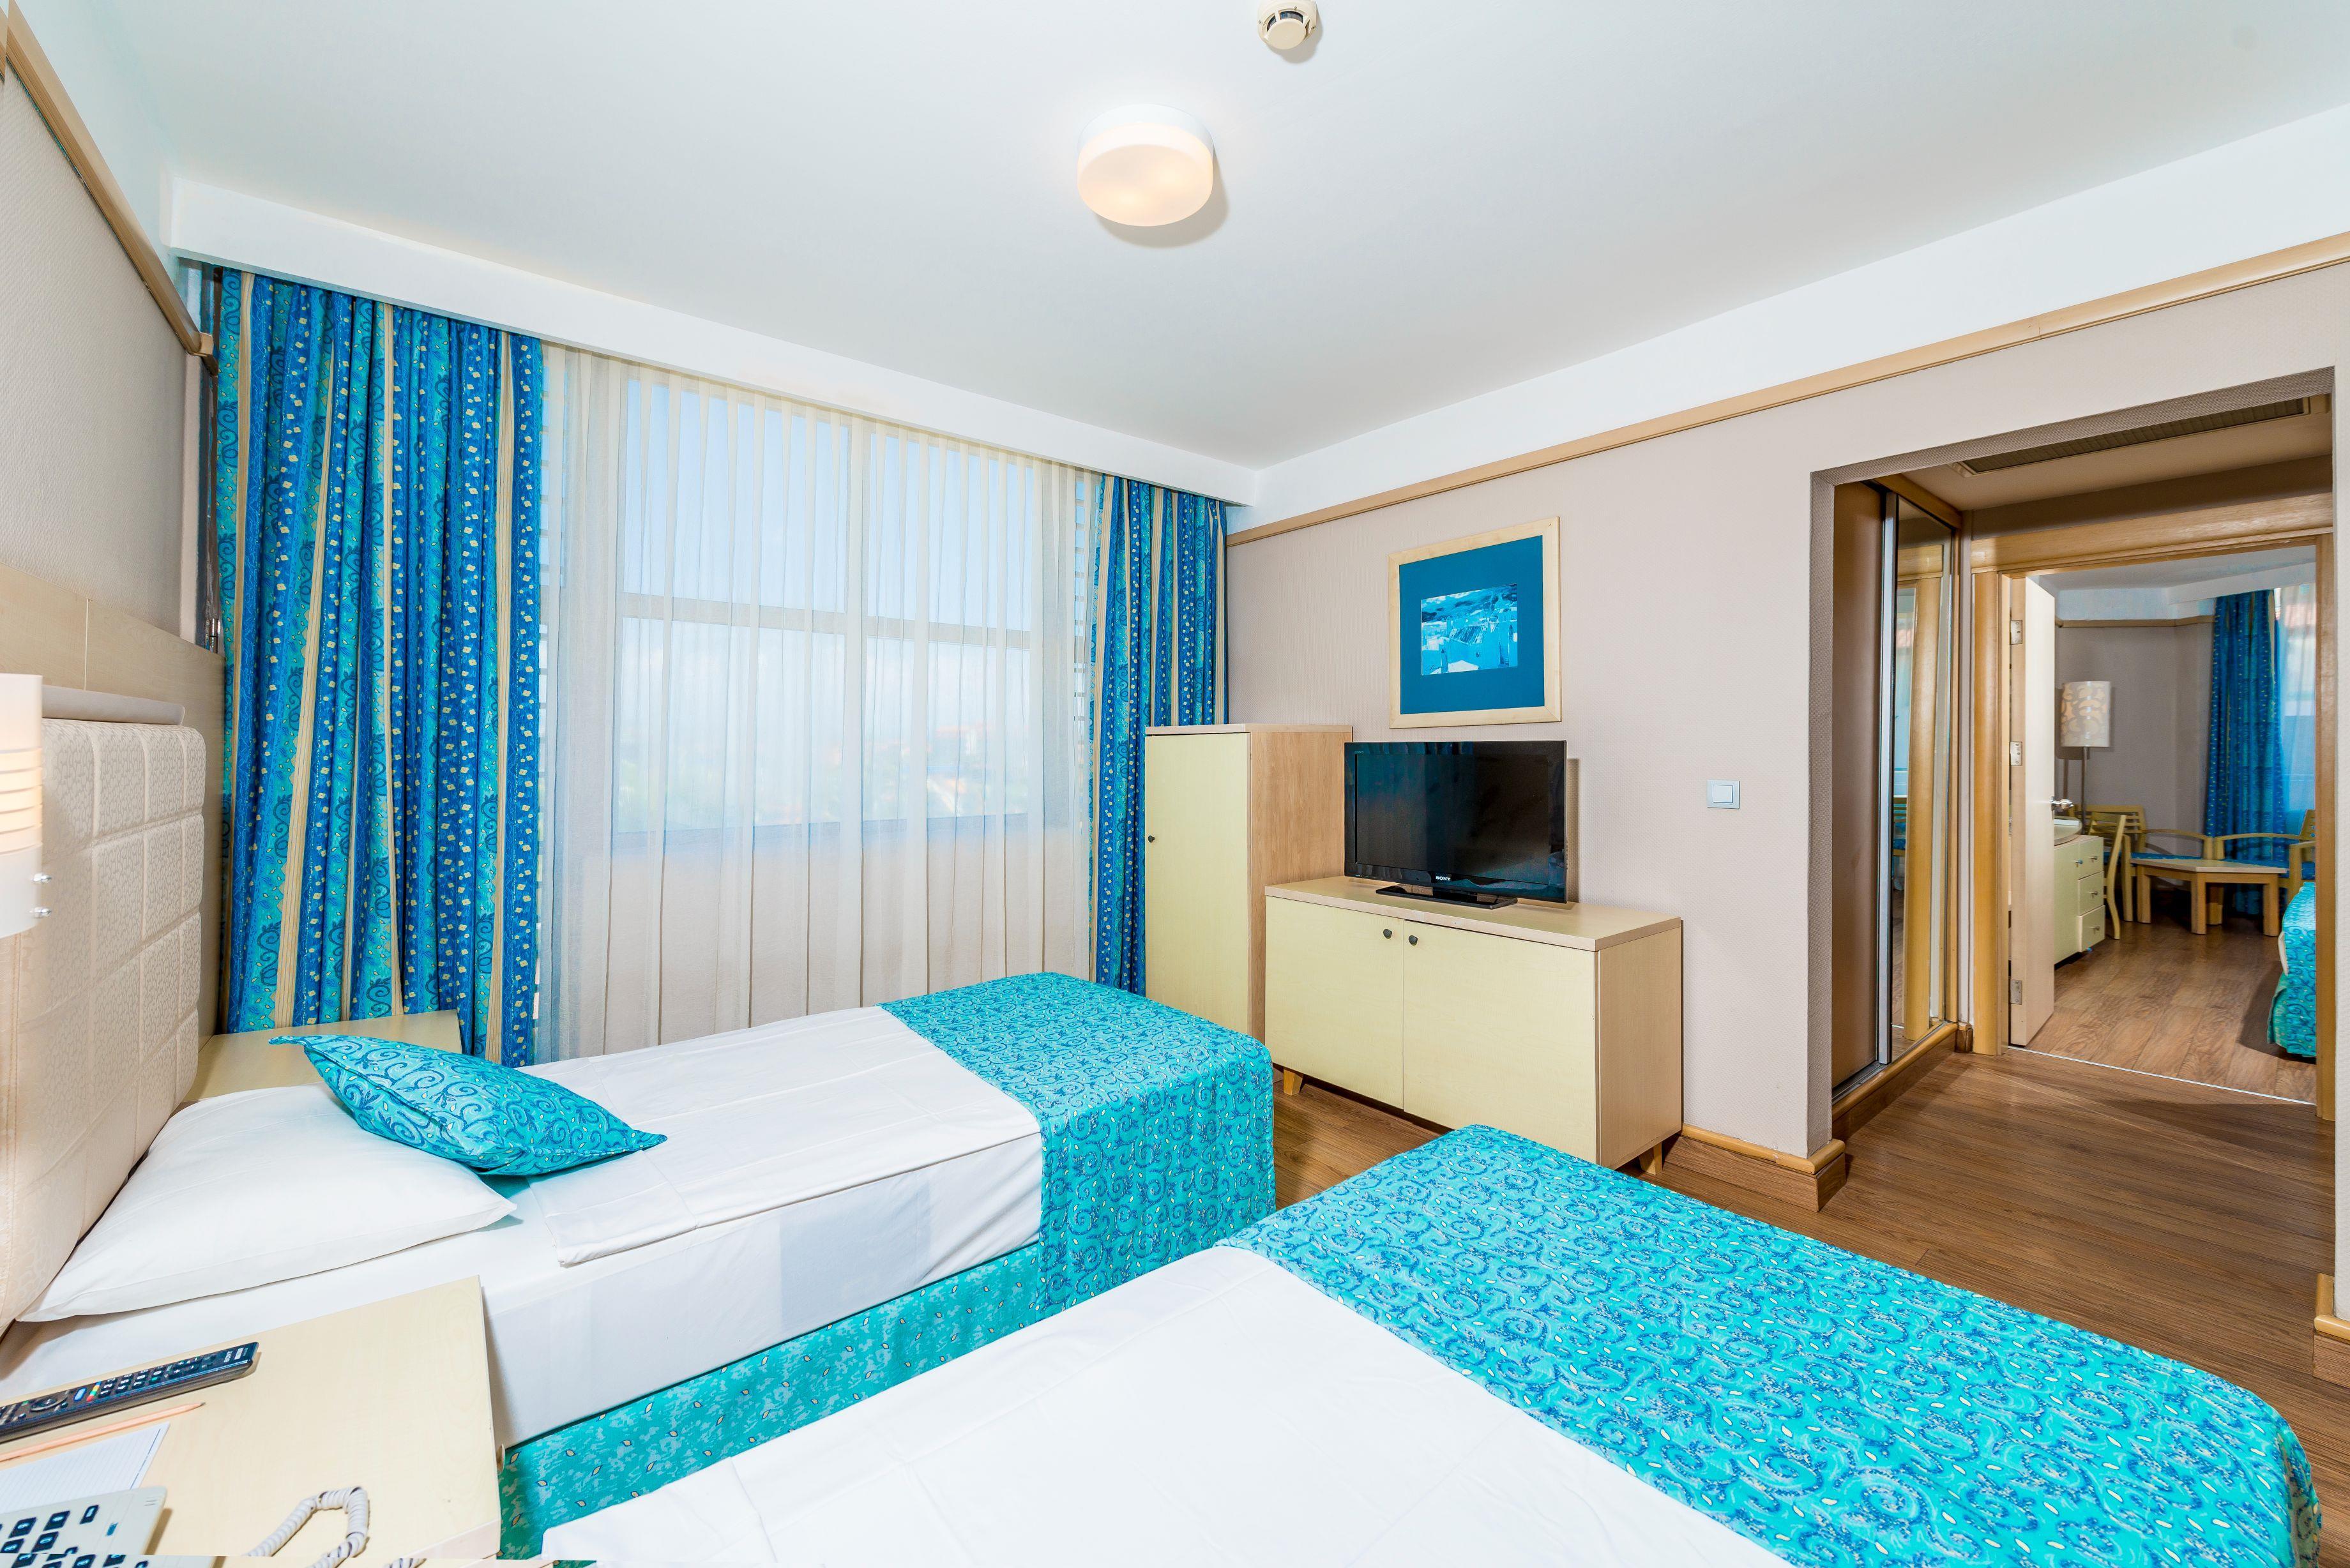 http://www.orextravel.sk/OREX/hotelphotos/vonresort-golden-coast-general-0012.jpg